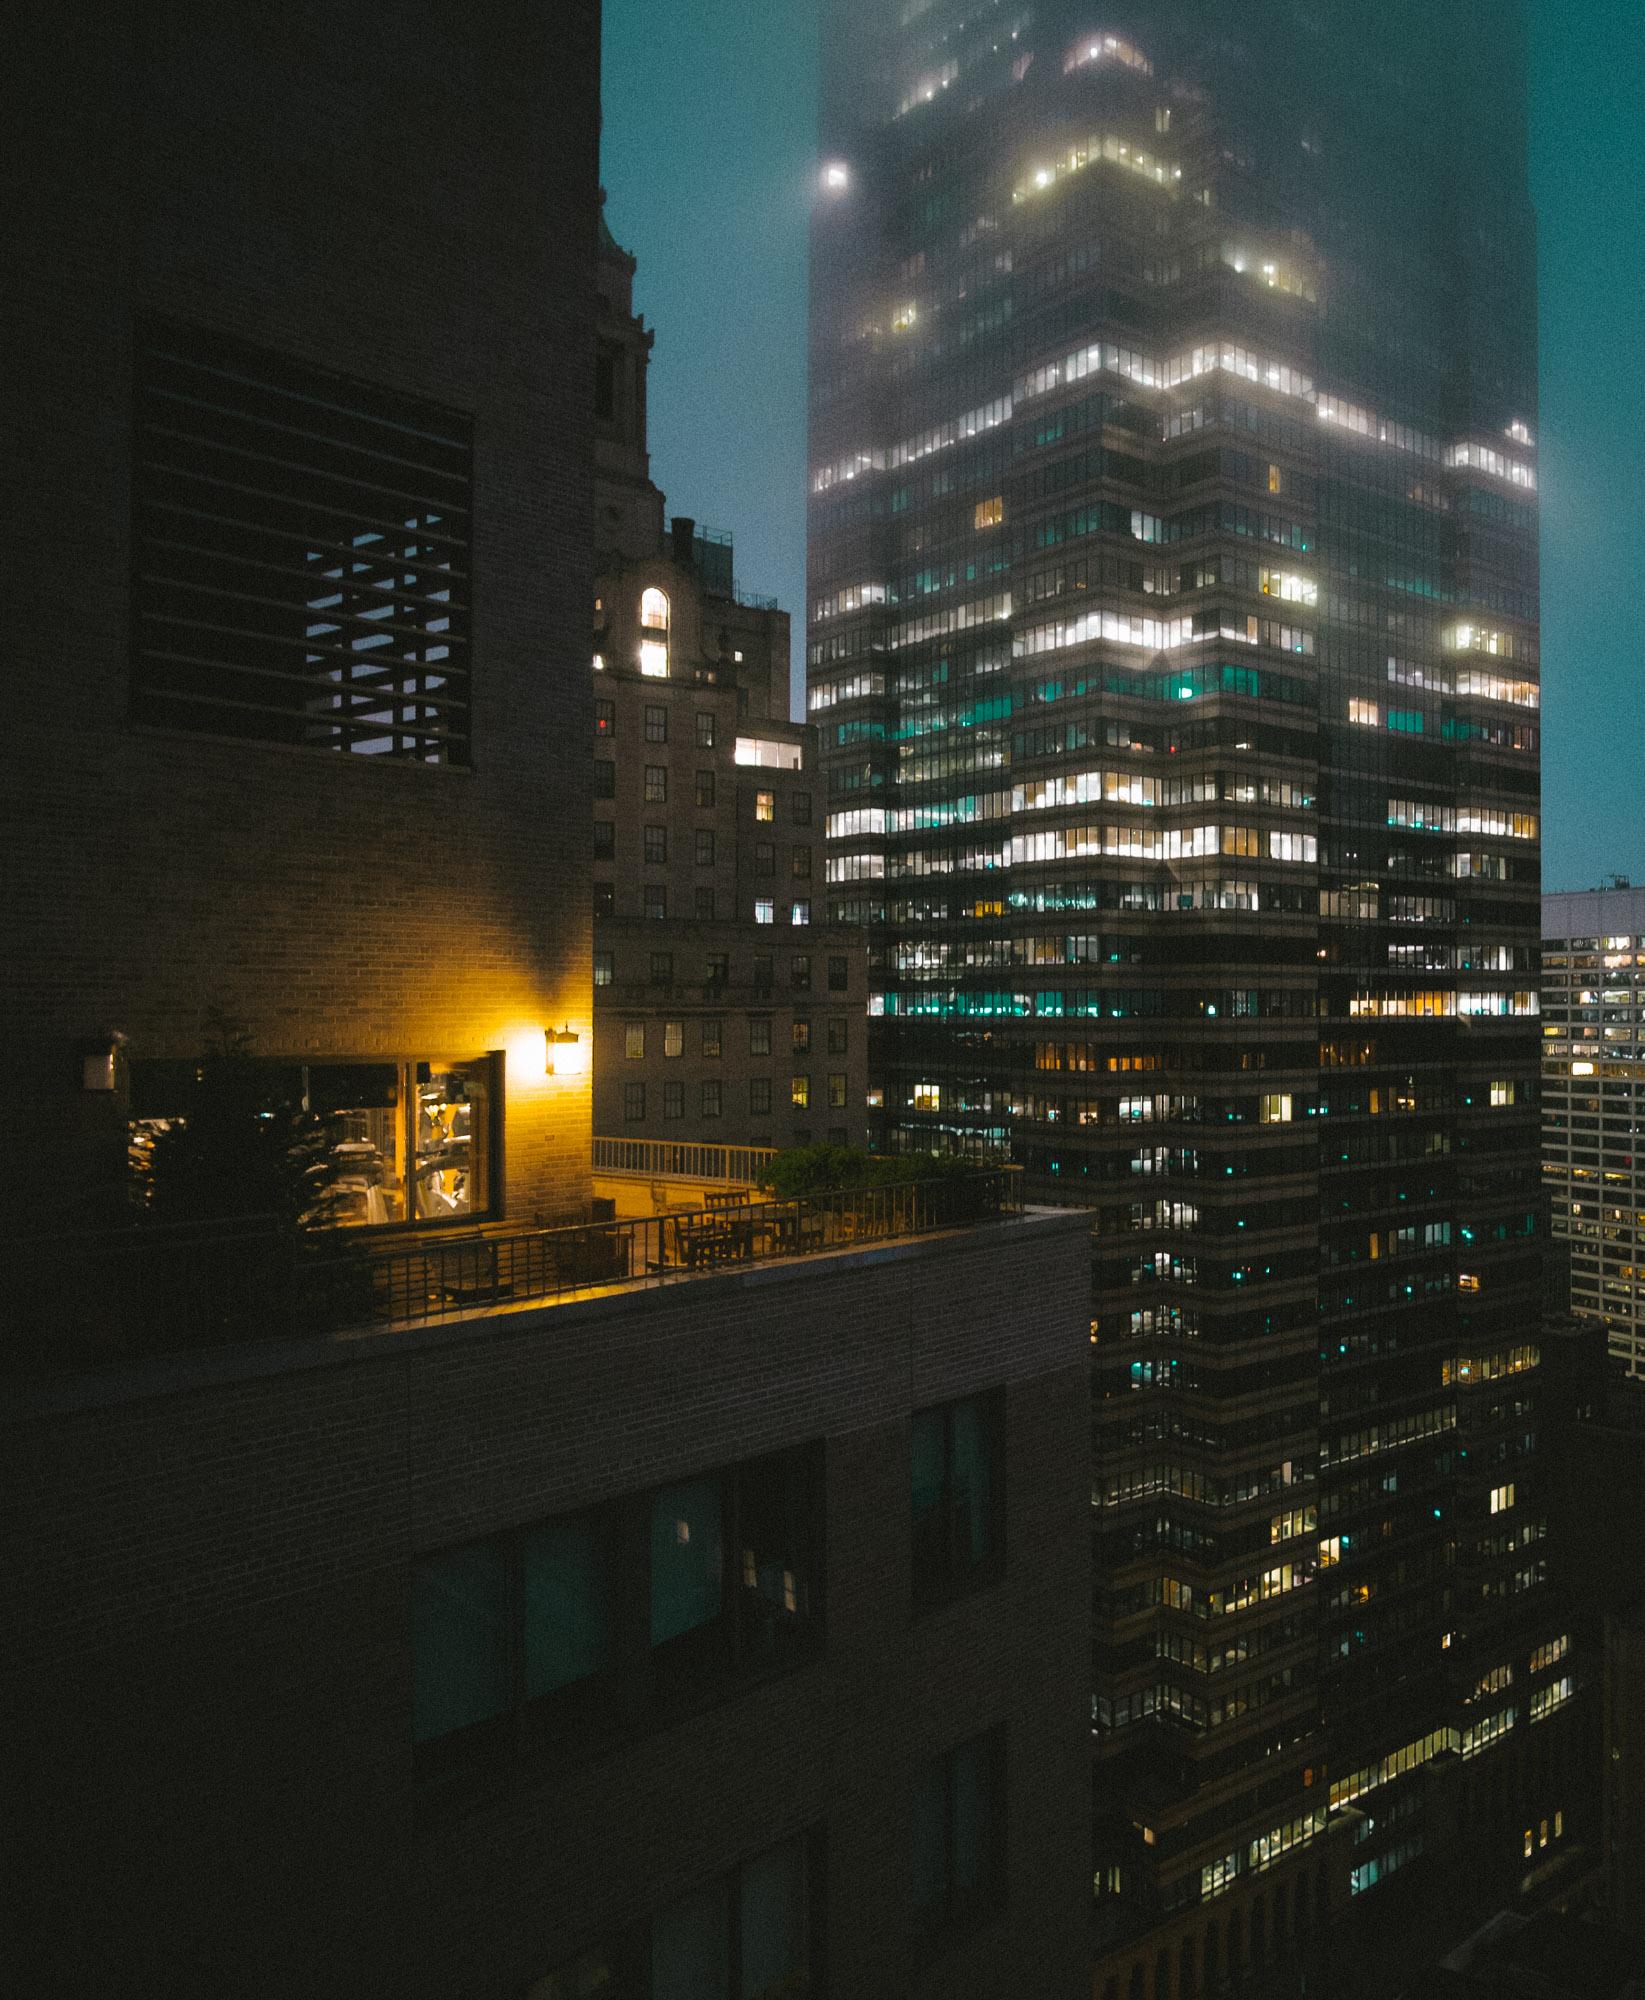 Foggy dawn on Wall Street. Fuji X-pro1, Rokinon 12mm f/2 (50% crop).